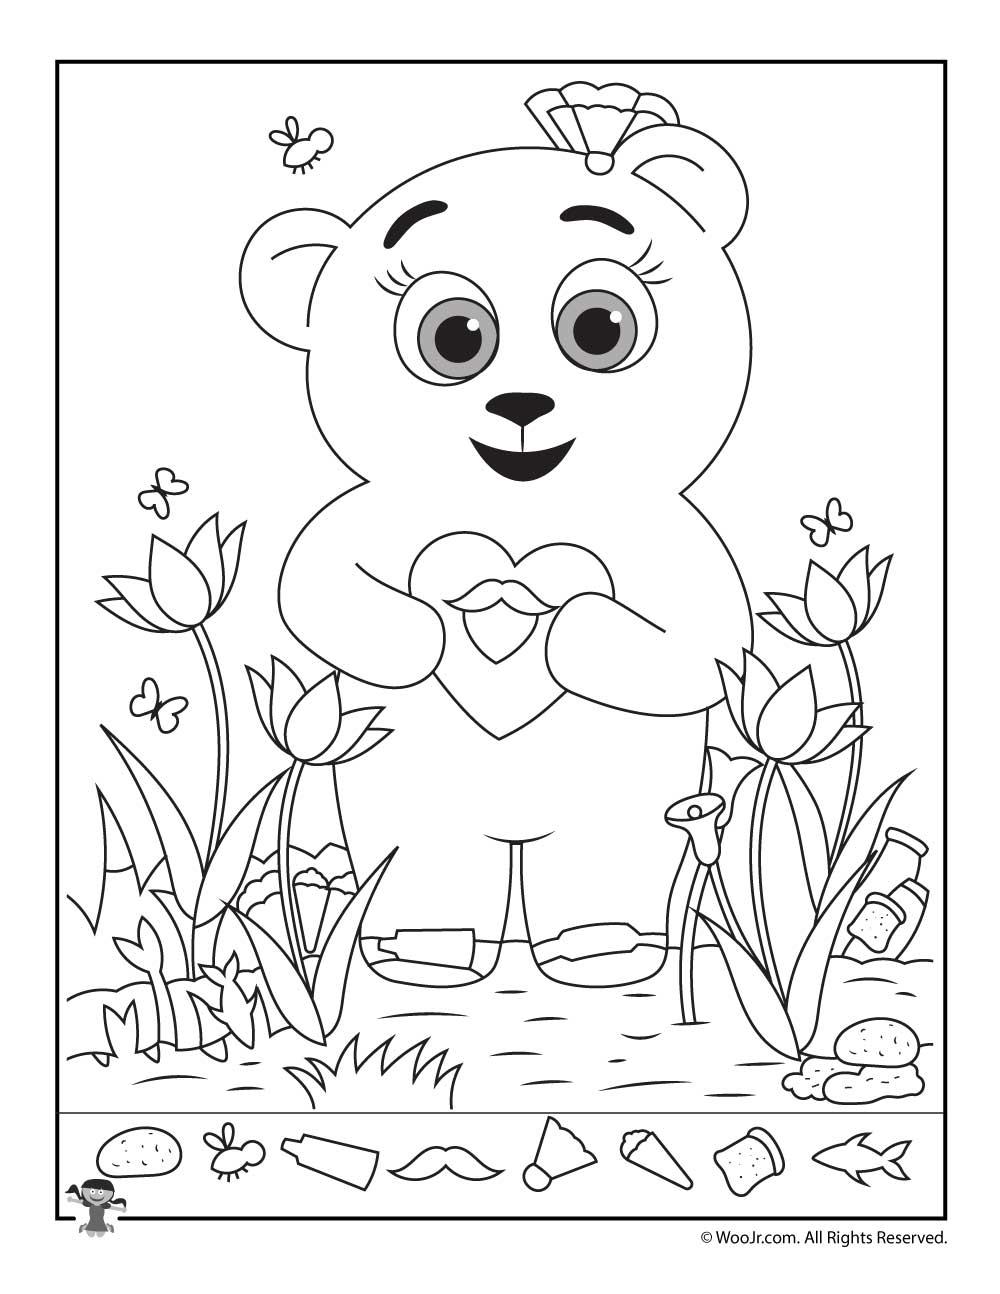 Valentine's Day Hidden Pictures Activity Pages   Woo! Jr. Kids - Free Printable Valentine Hidden Pictures